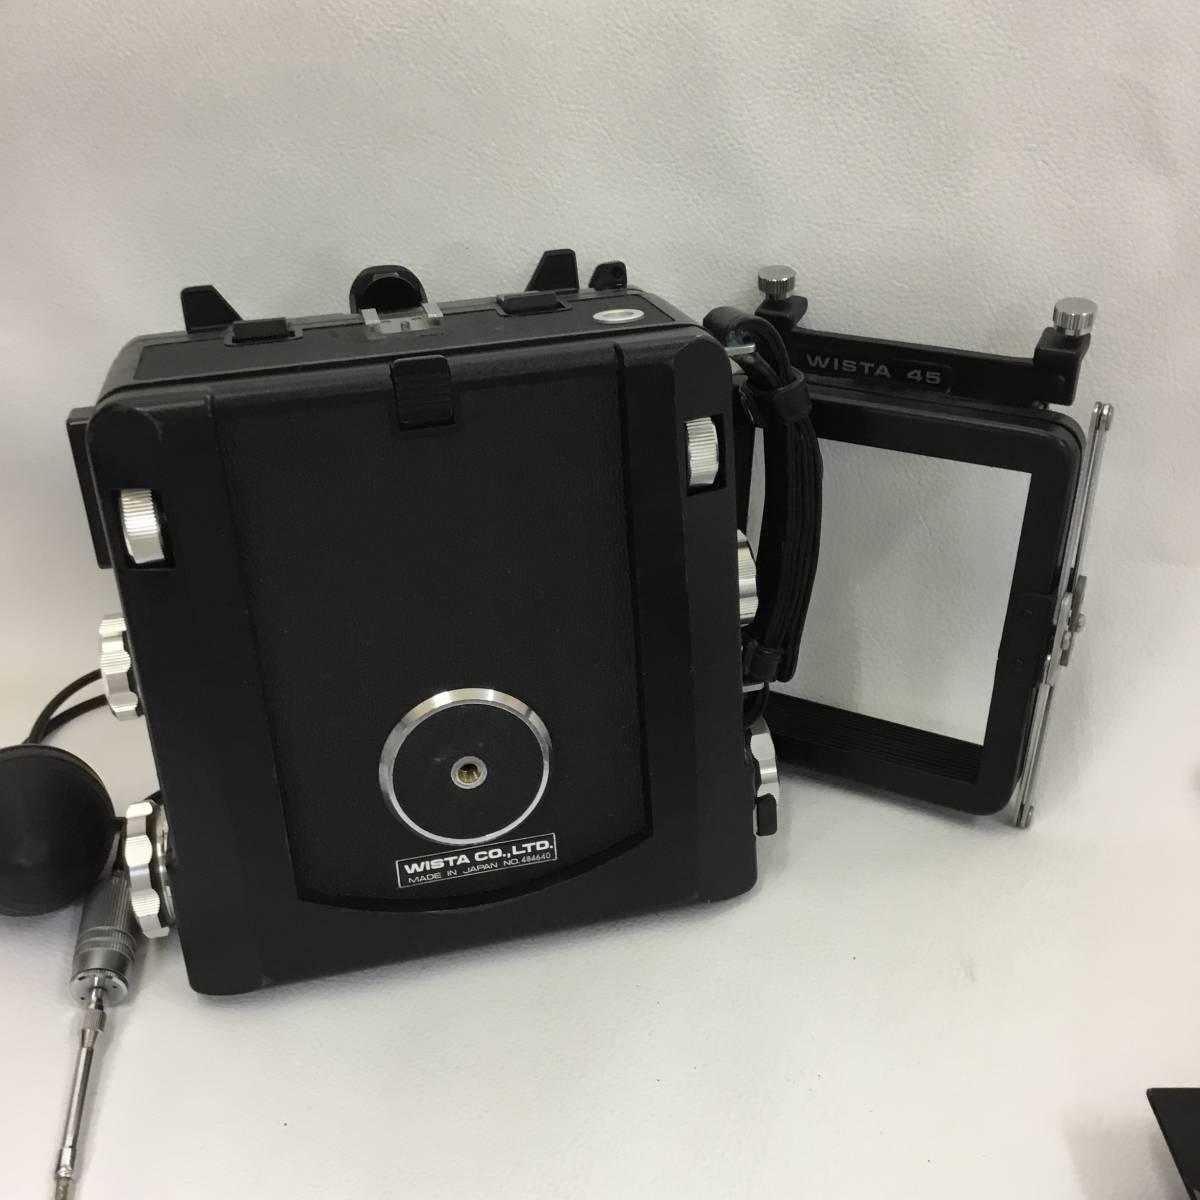 WISTA 45 ウィスタ45 レンズ 付属品セット 大判カメラ_画像8